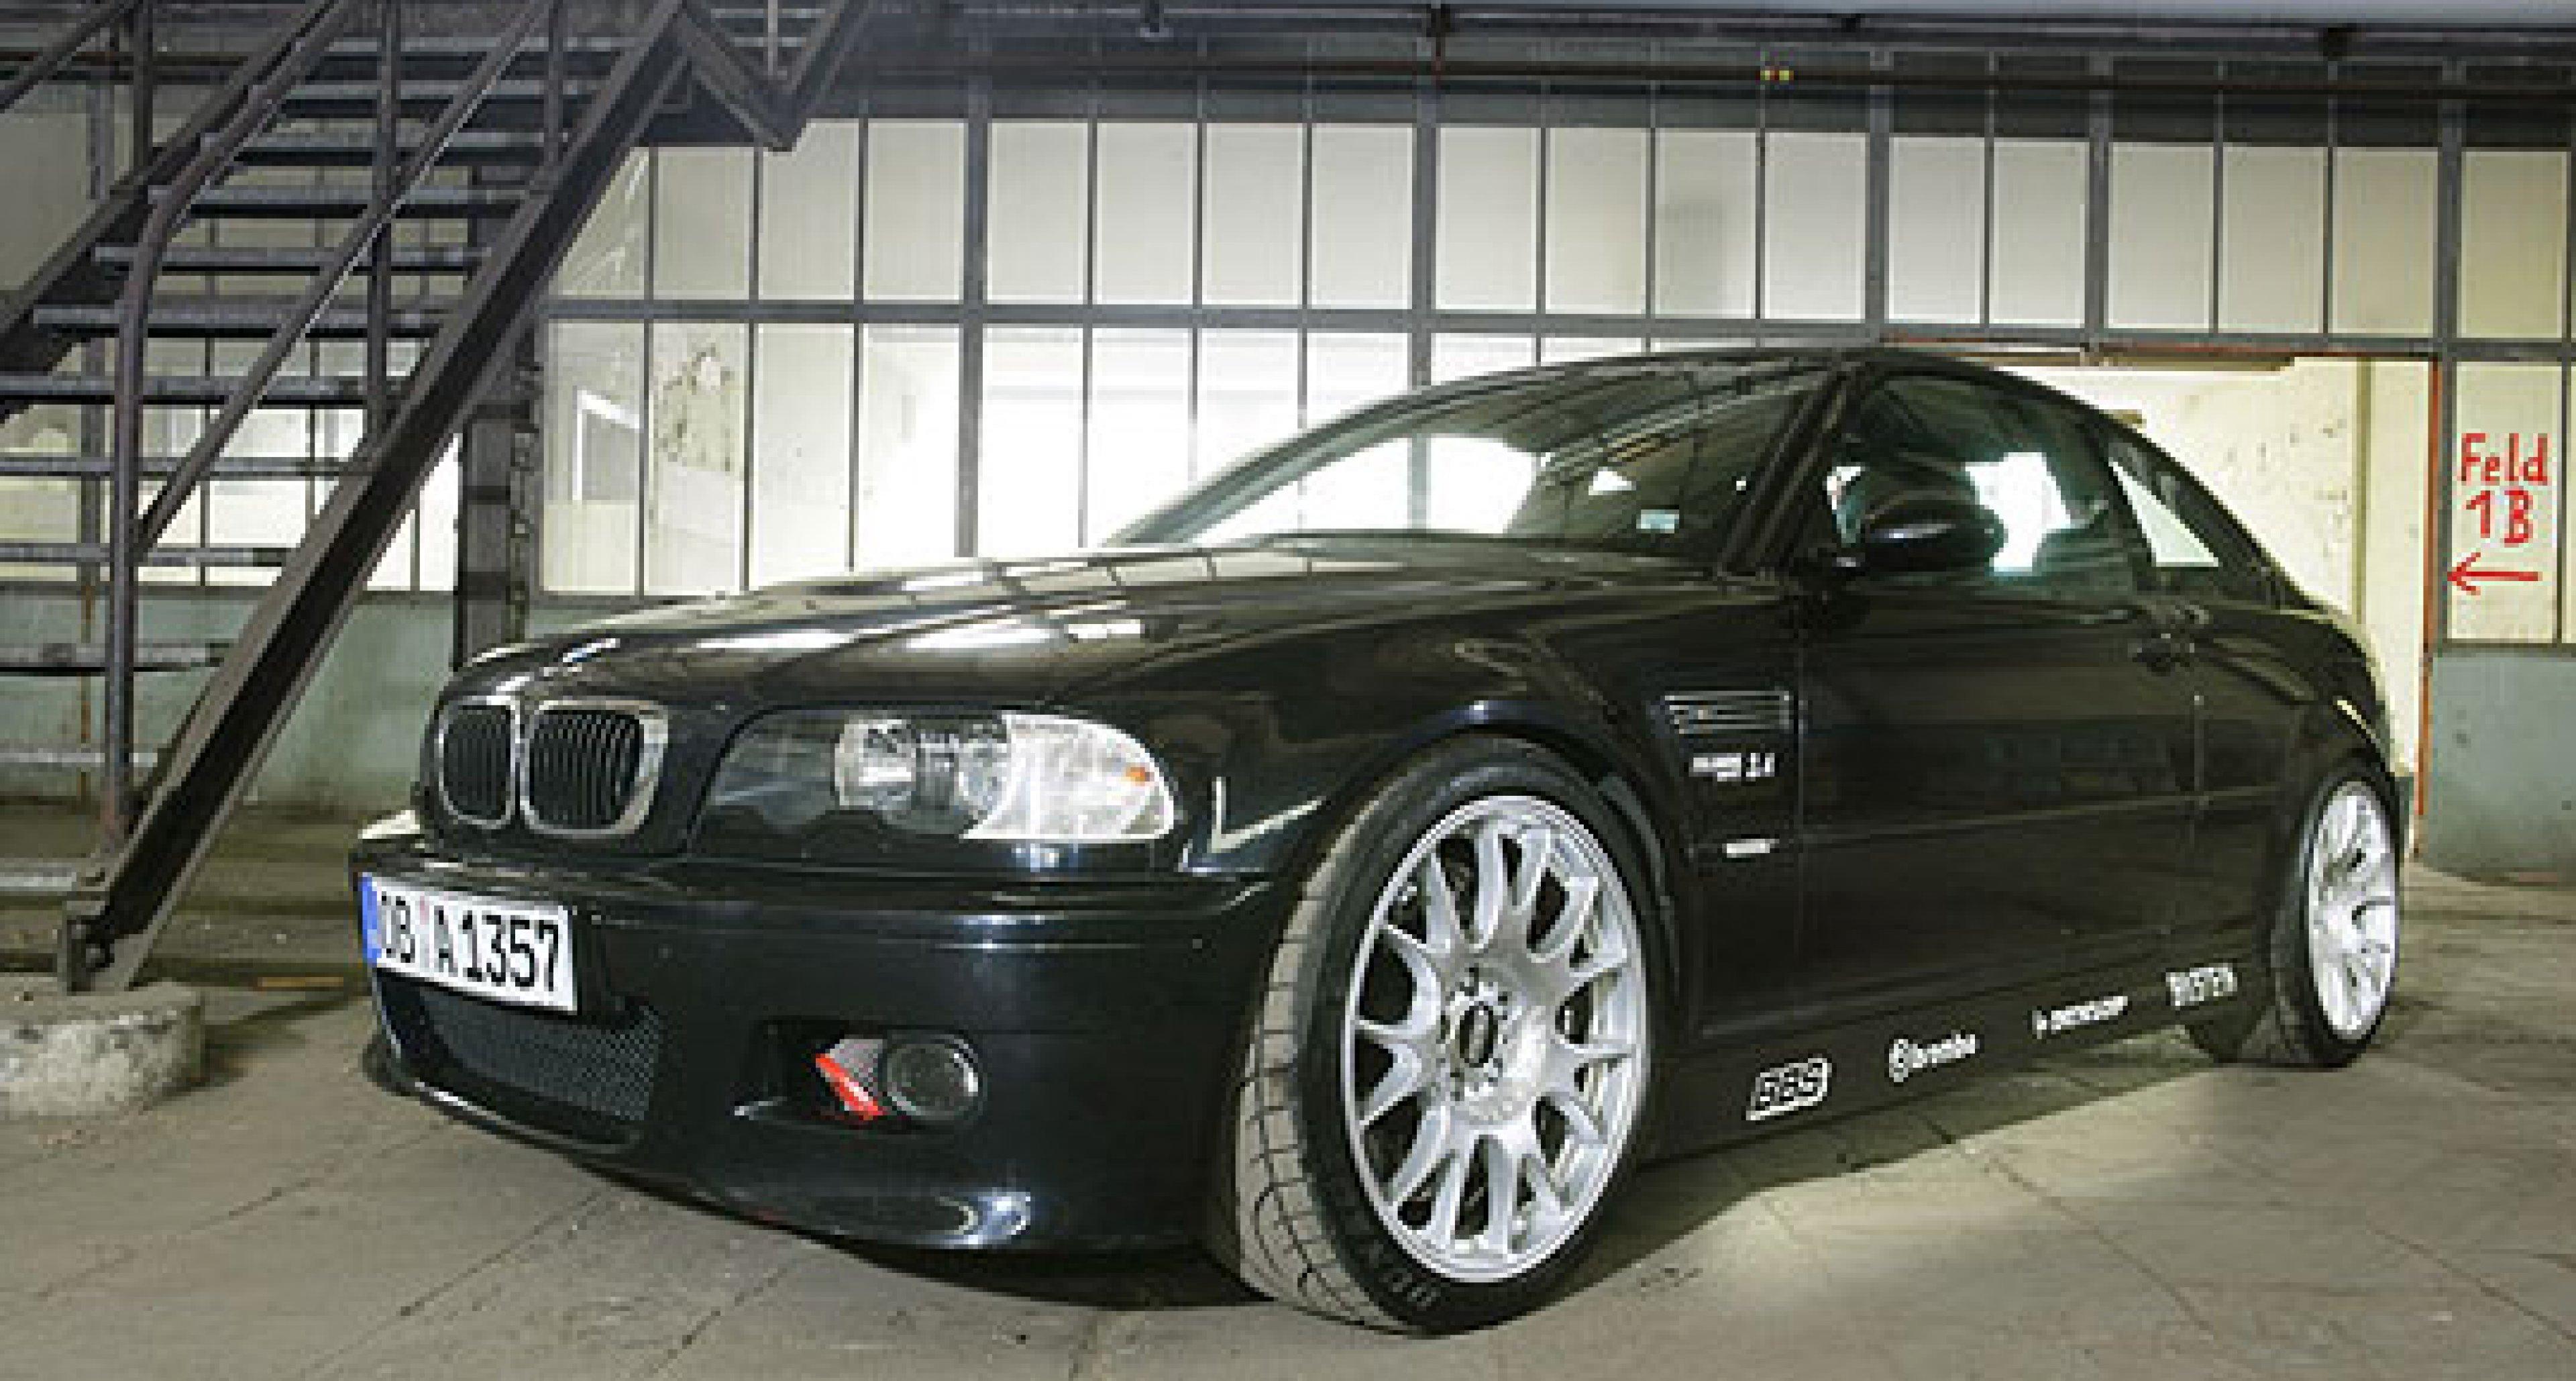 BMW M3 Kelleners-Sport: Im Ausnahmezustand